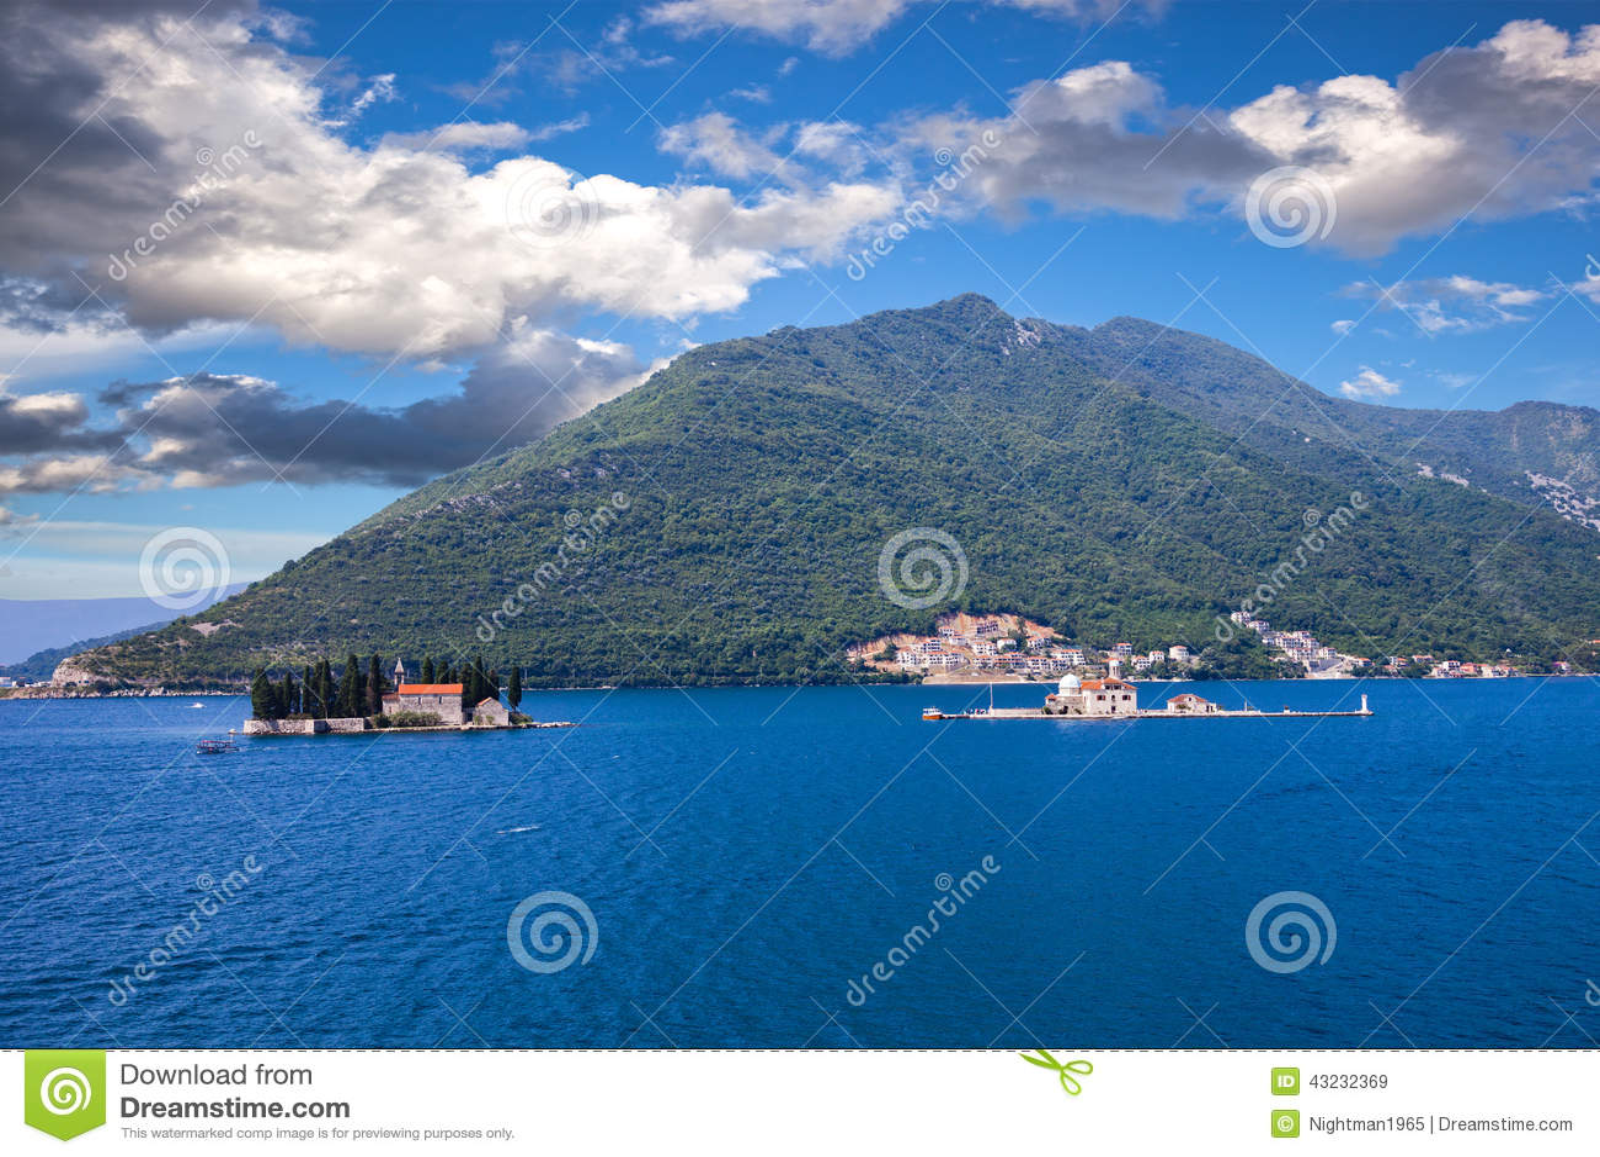 Islands Off The Coast Of Perast Stock Photo - Image: 43232369